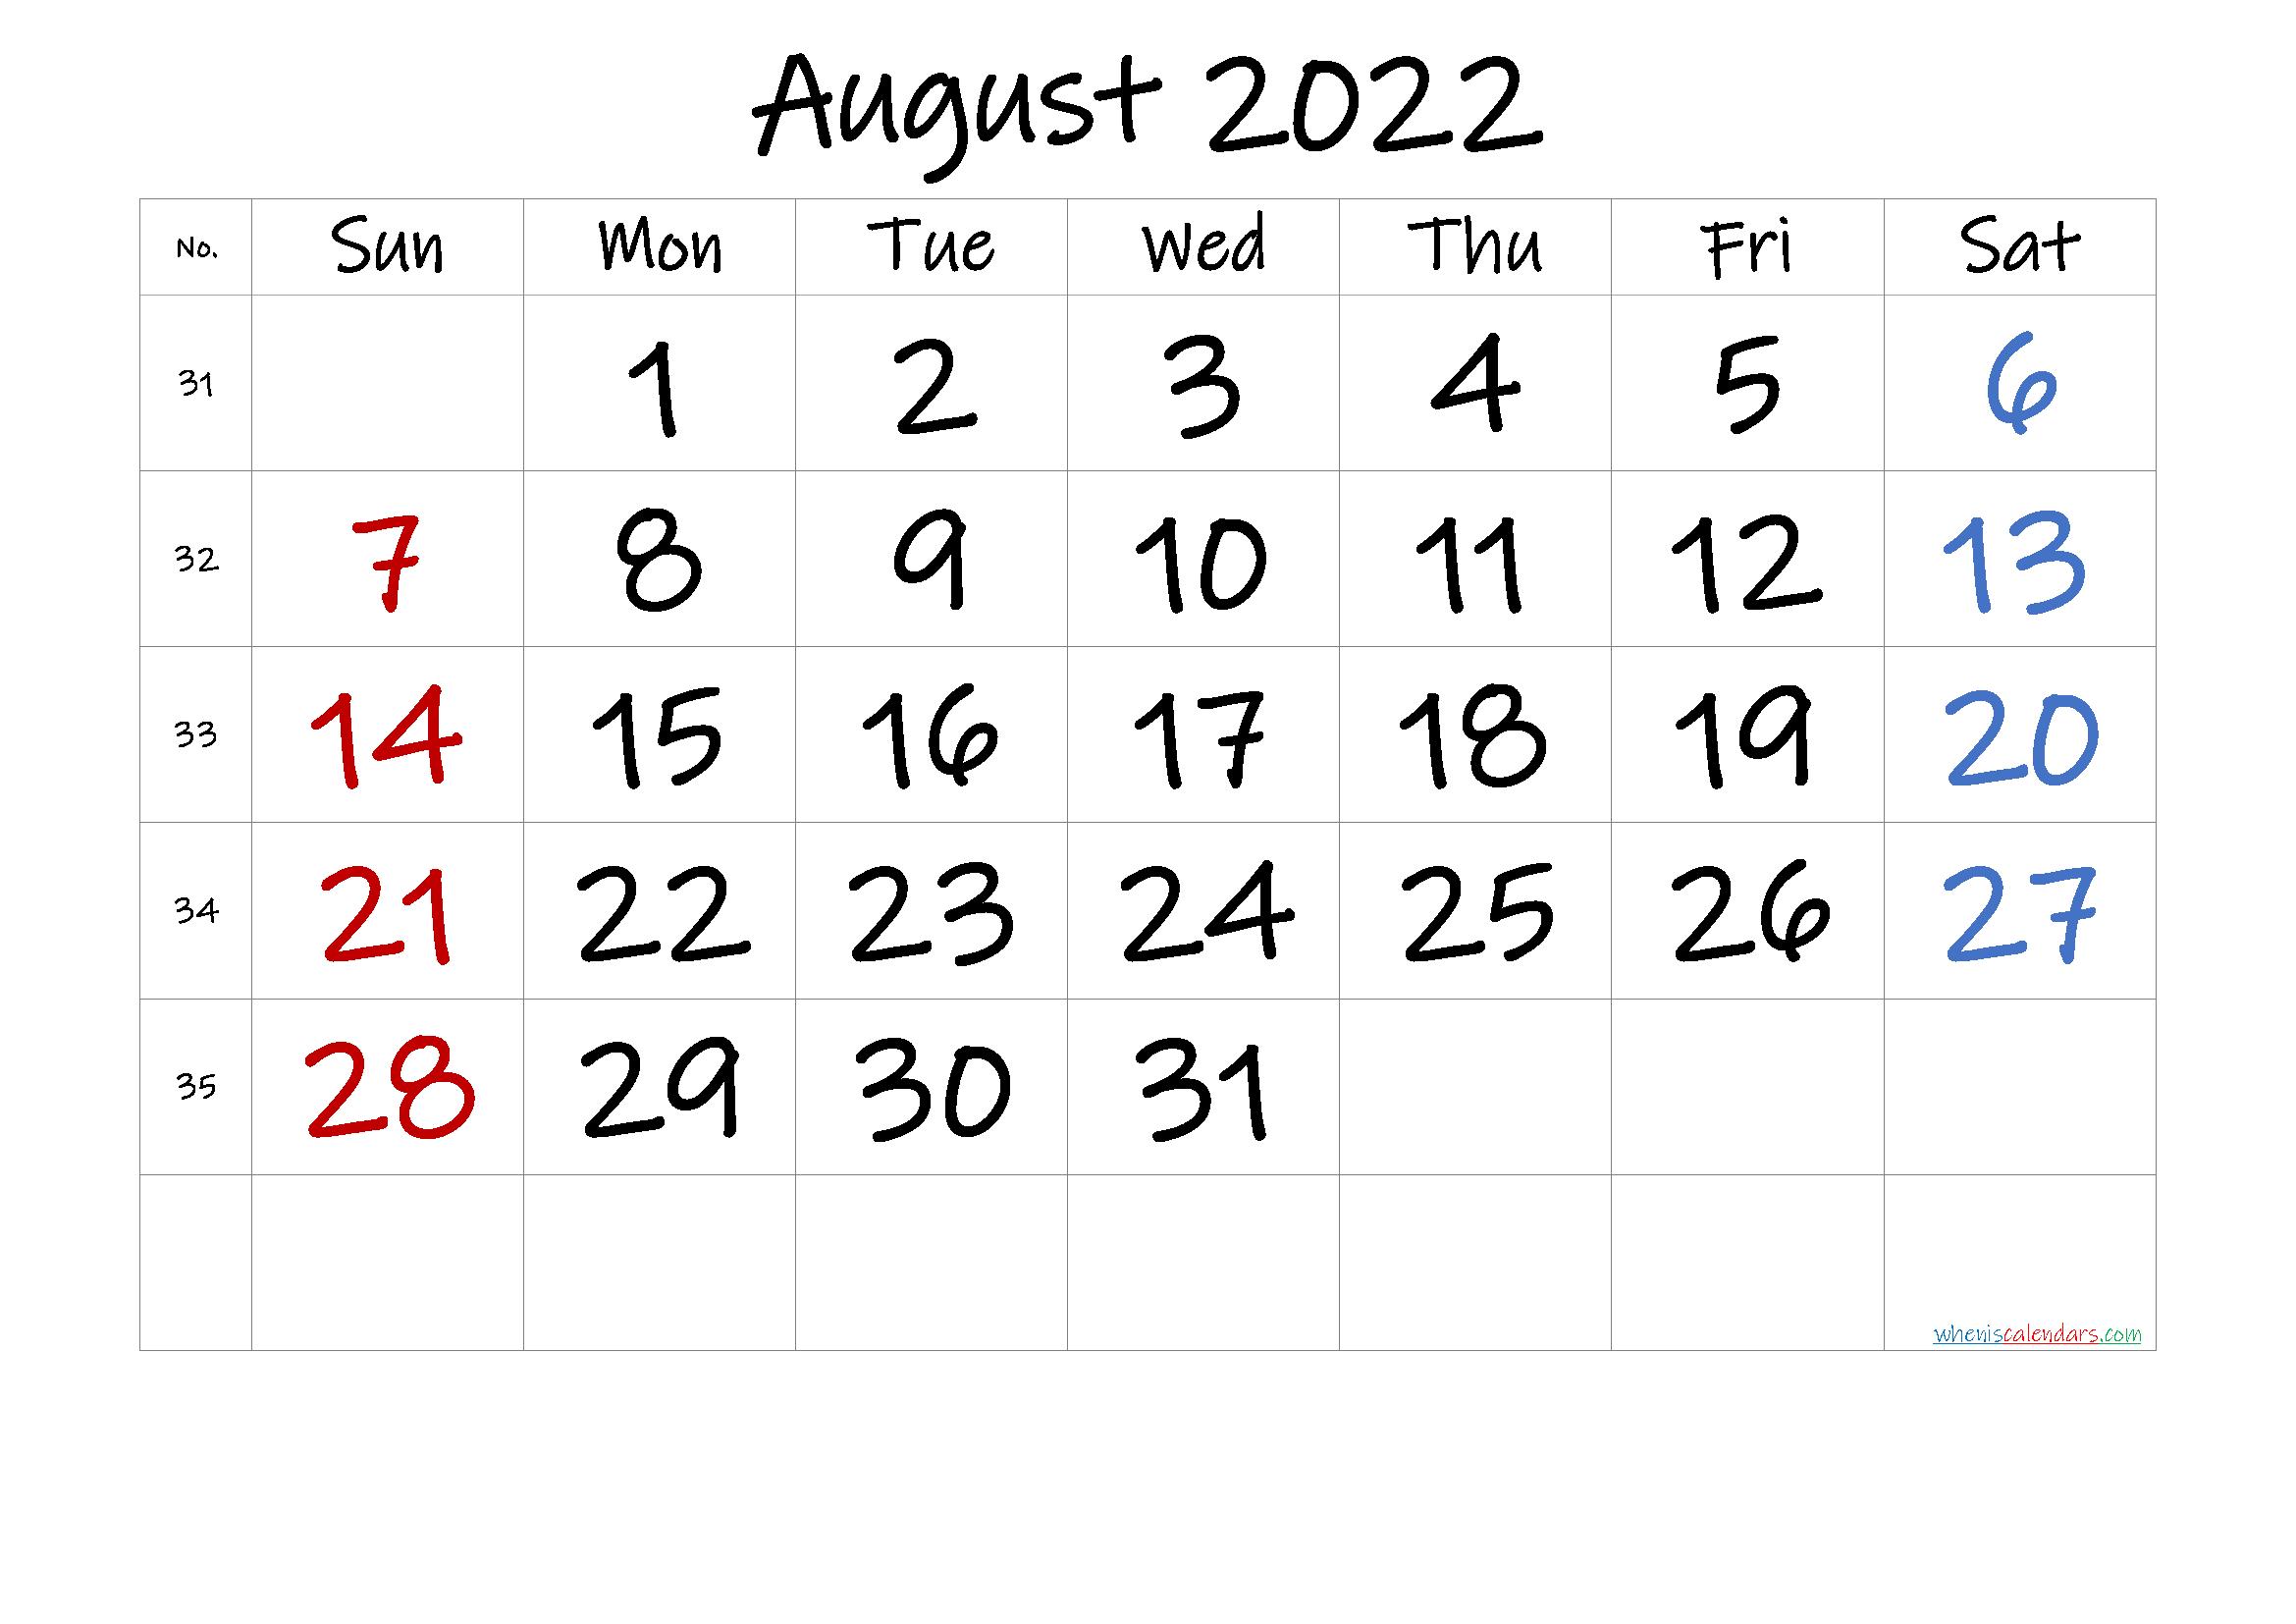 August 2022 Printable Calendar With Holidays - 6 Templates inside Printable Monthly Calendar August 2022 Photo